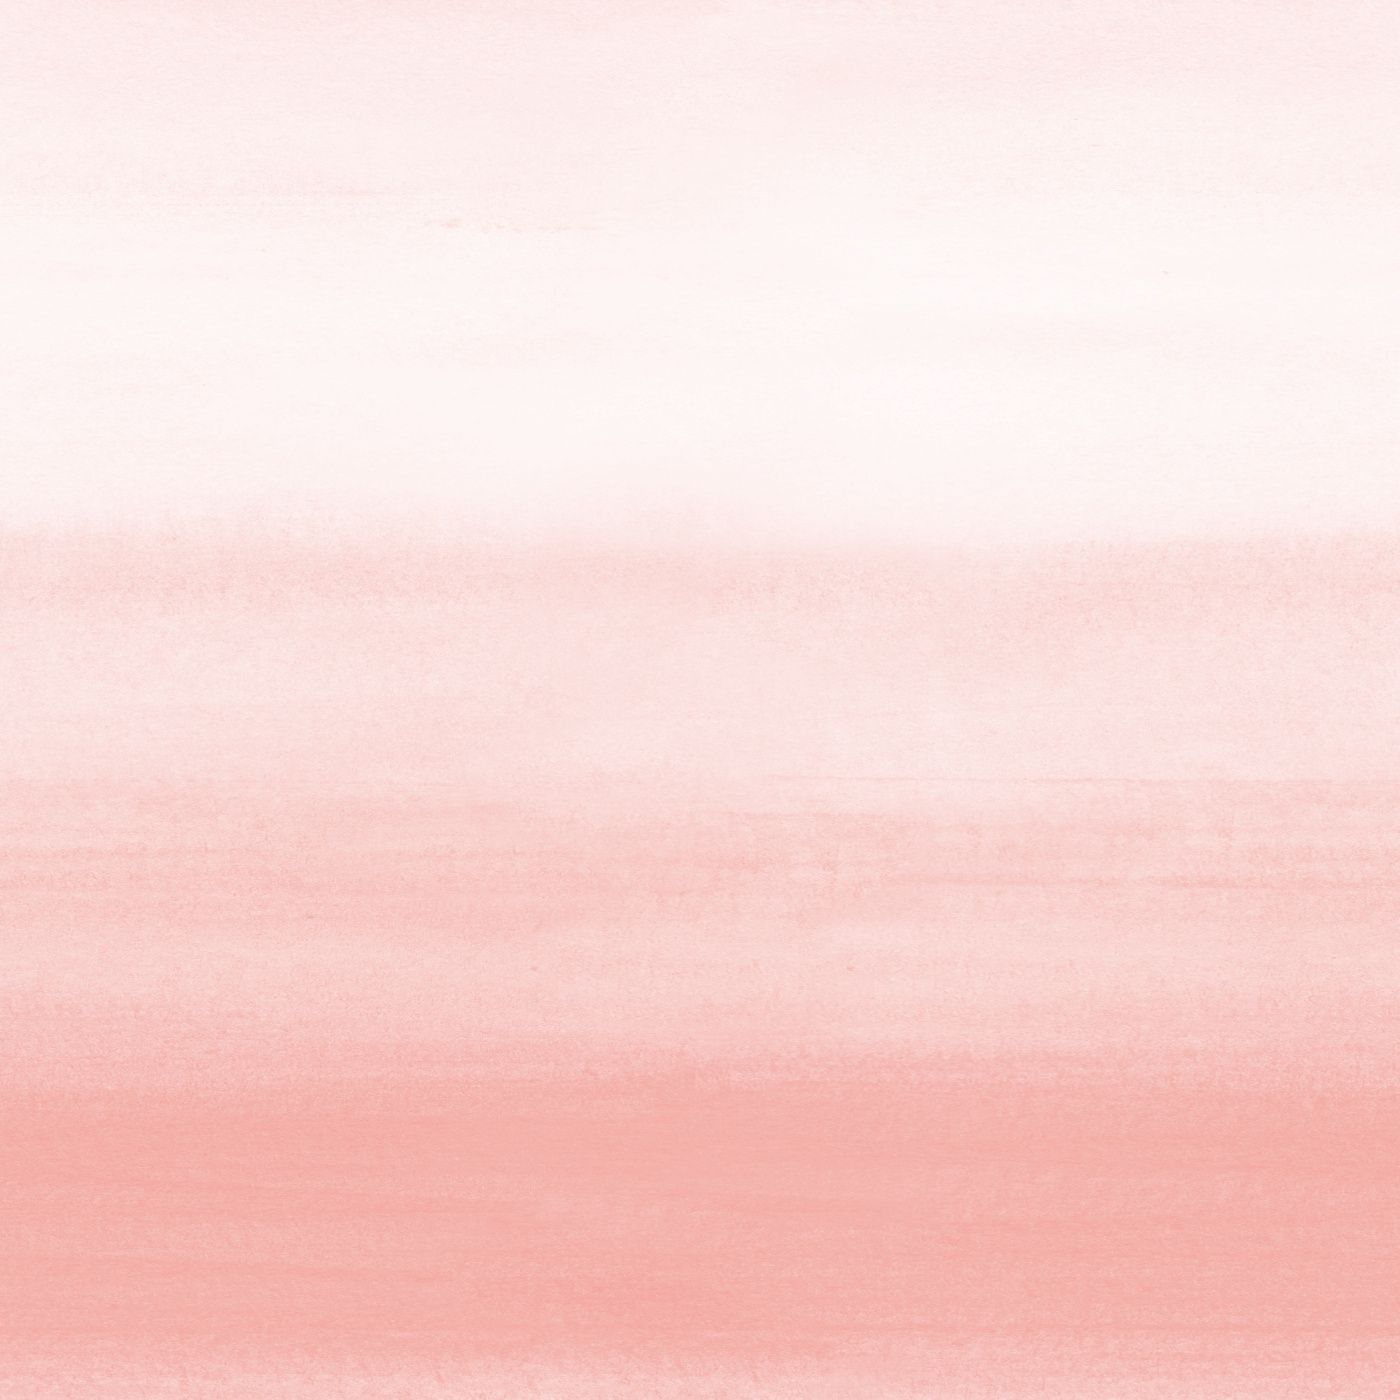 Watercolor Ombre Wallpaper